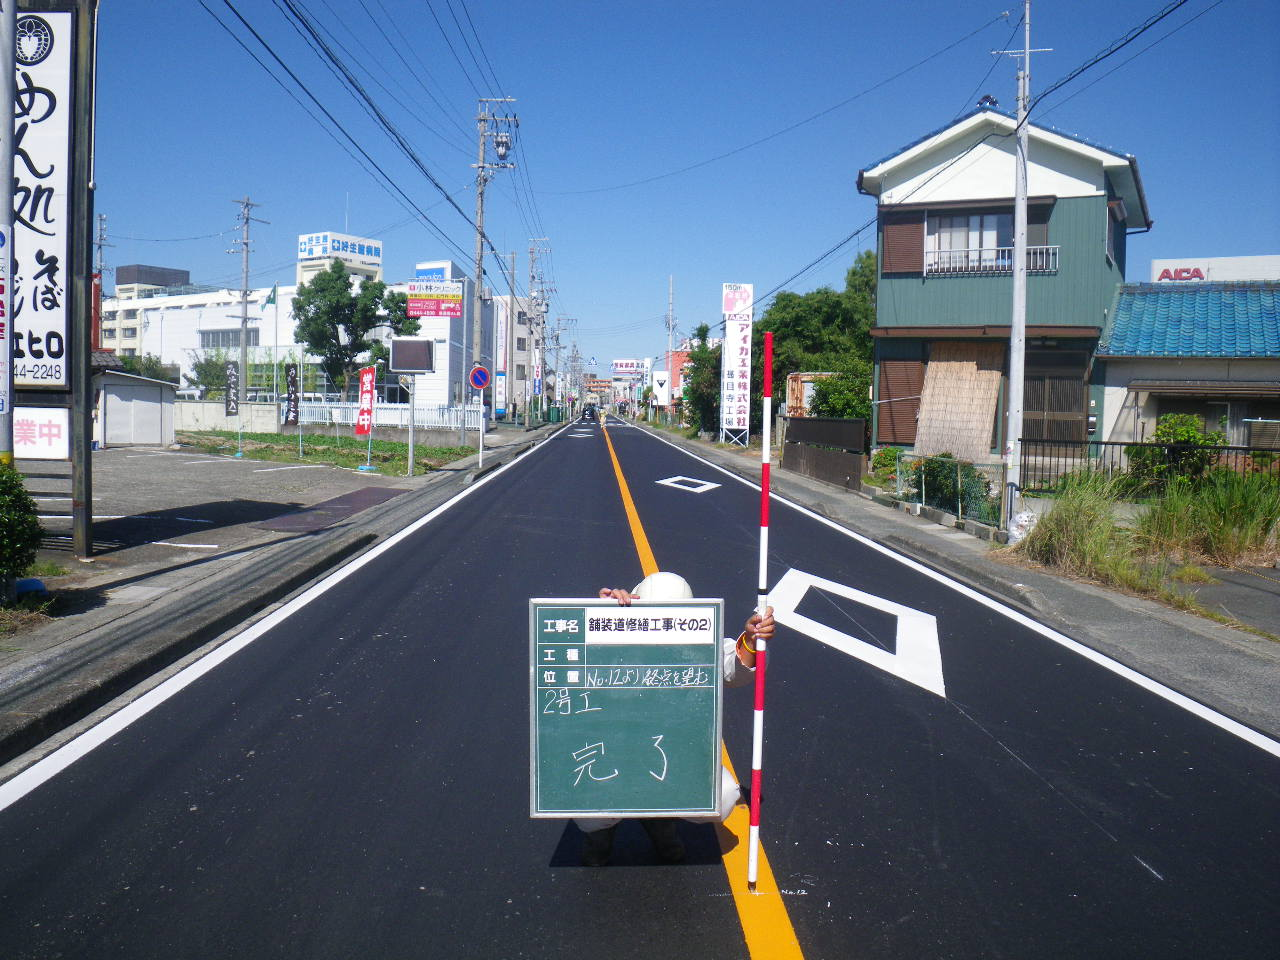 海部建設株式会社の優良工事表彰(舗装道修繕工事(その2))